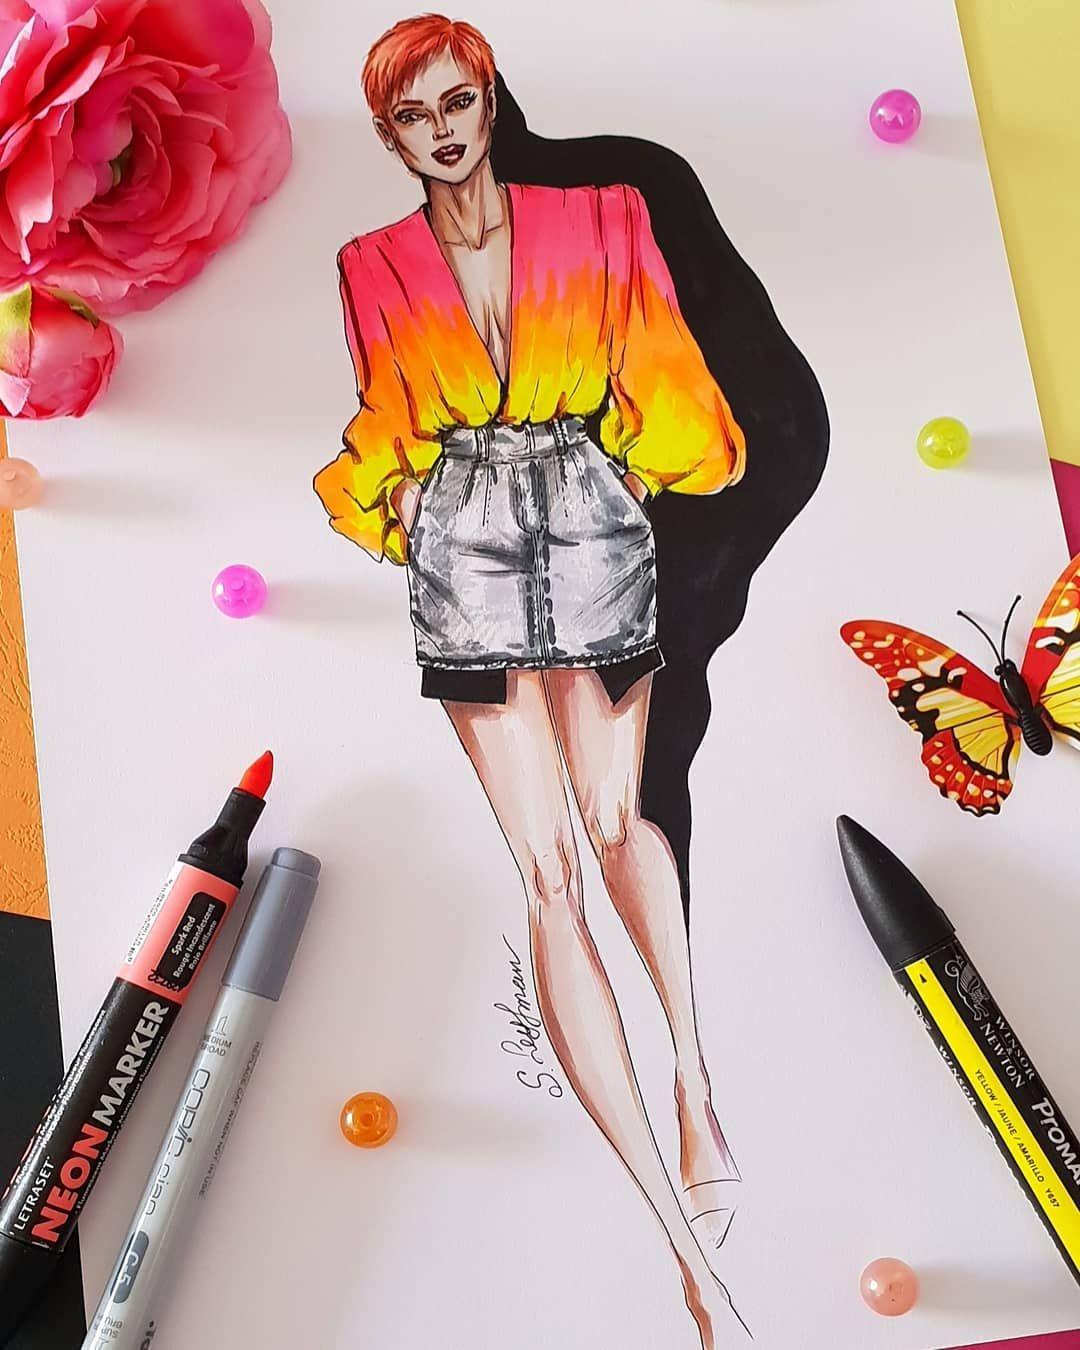 Sveta Slobodov Leyfman On Instagram Neon Add Shine To Fashion Illustration Sketches Fashion Illustration Sketches Dresses Fashion Illustrations Techniques